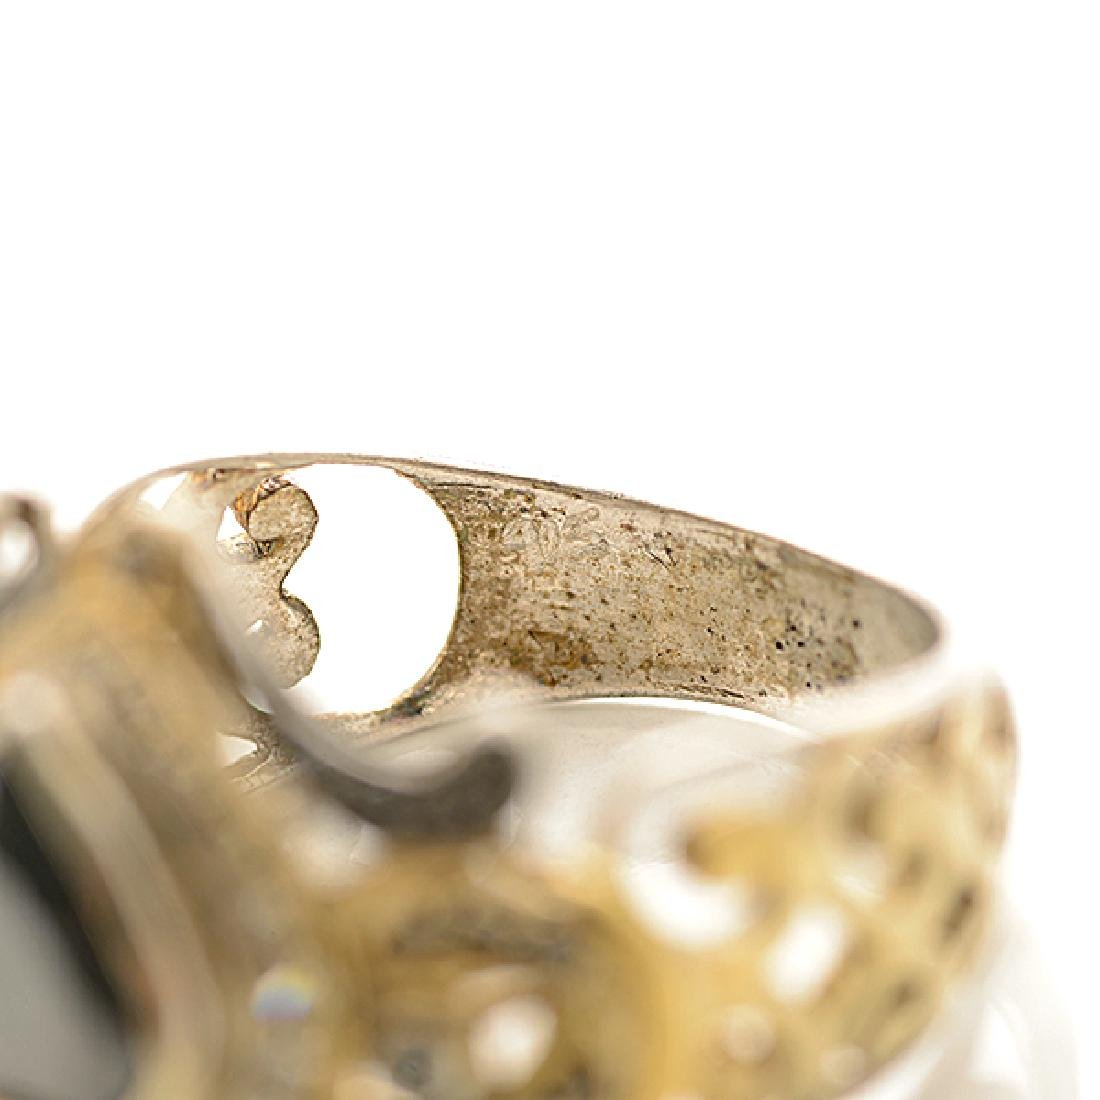 Black Diamond, Diamond, Sterling Silver, Gold Ring. - 4